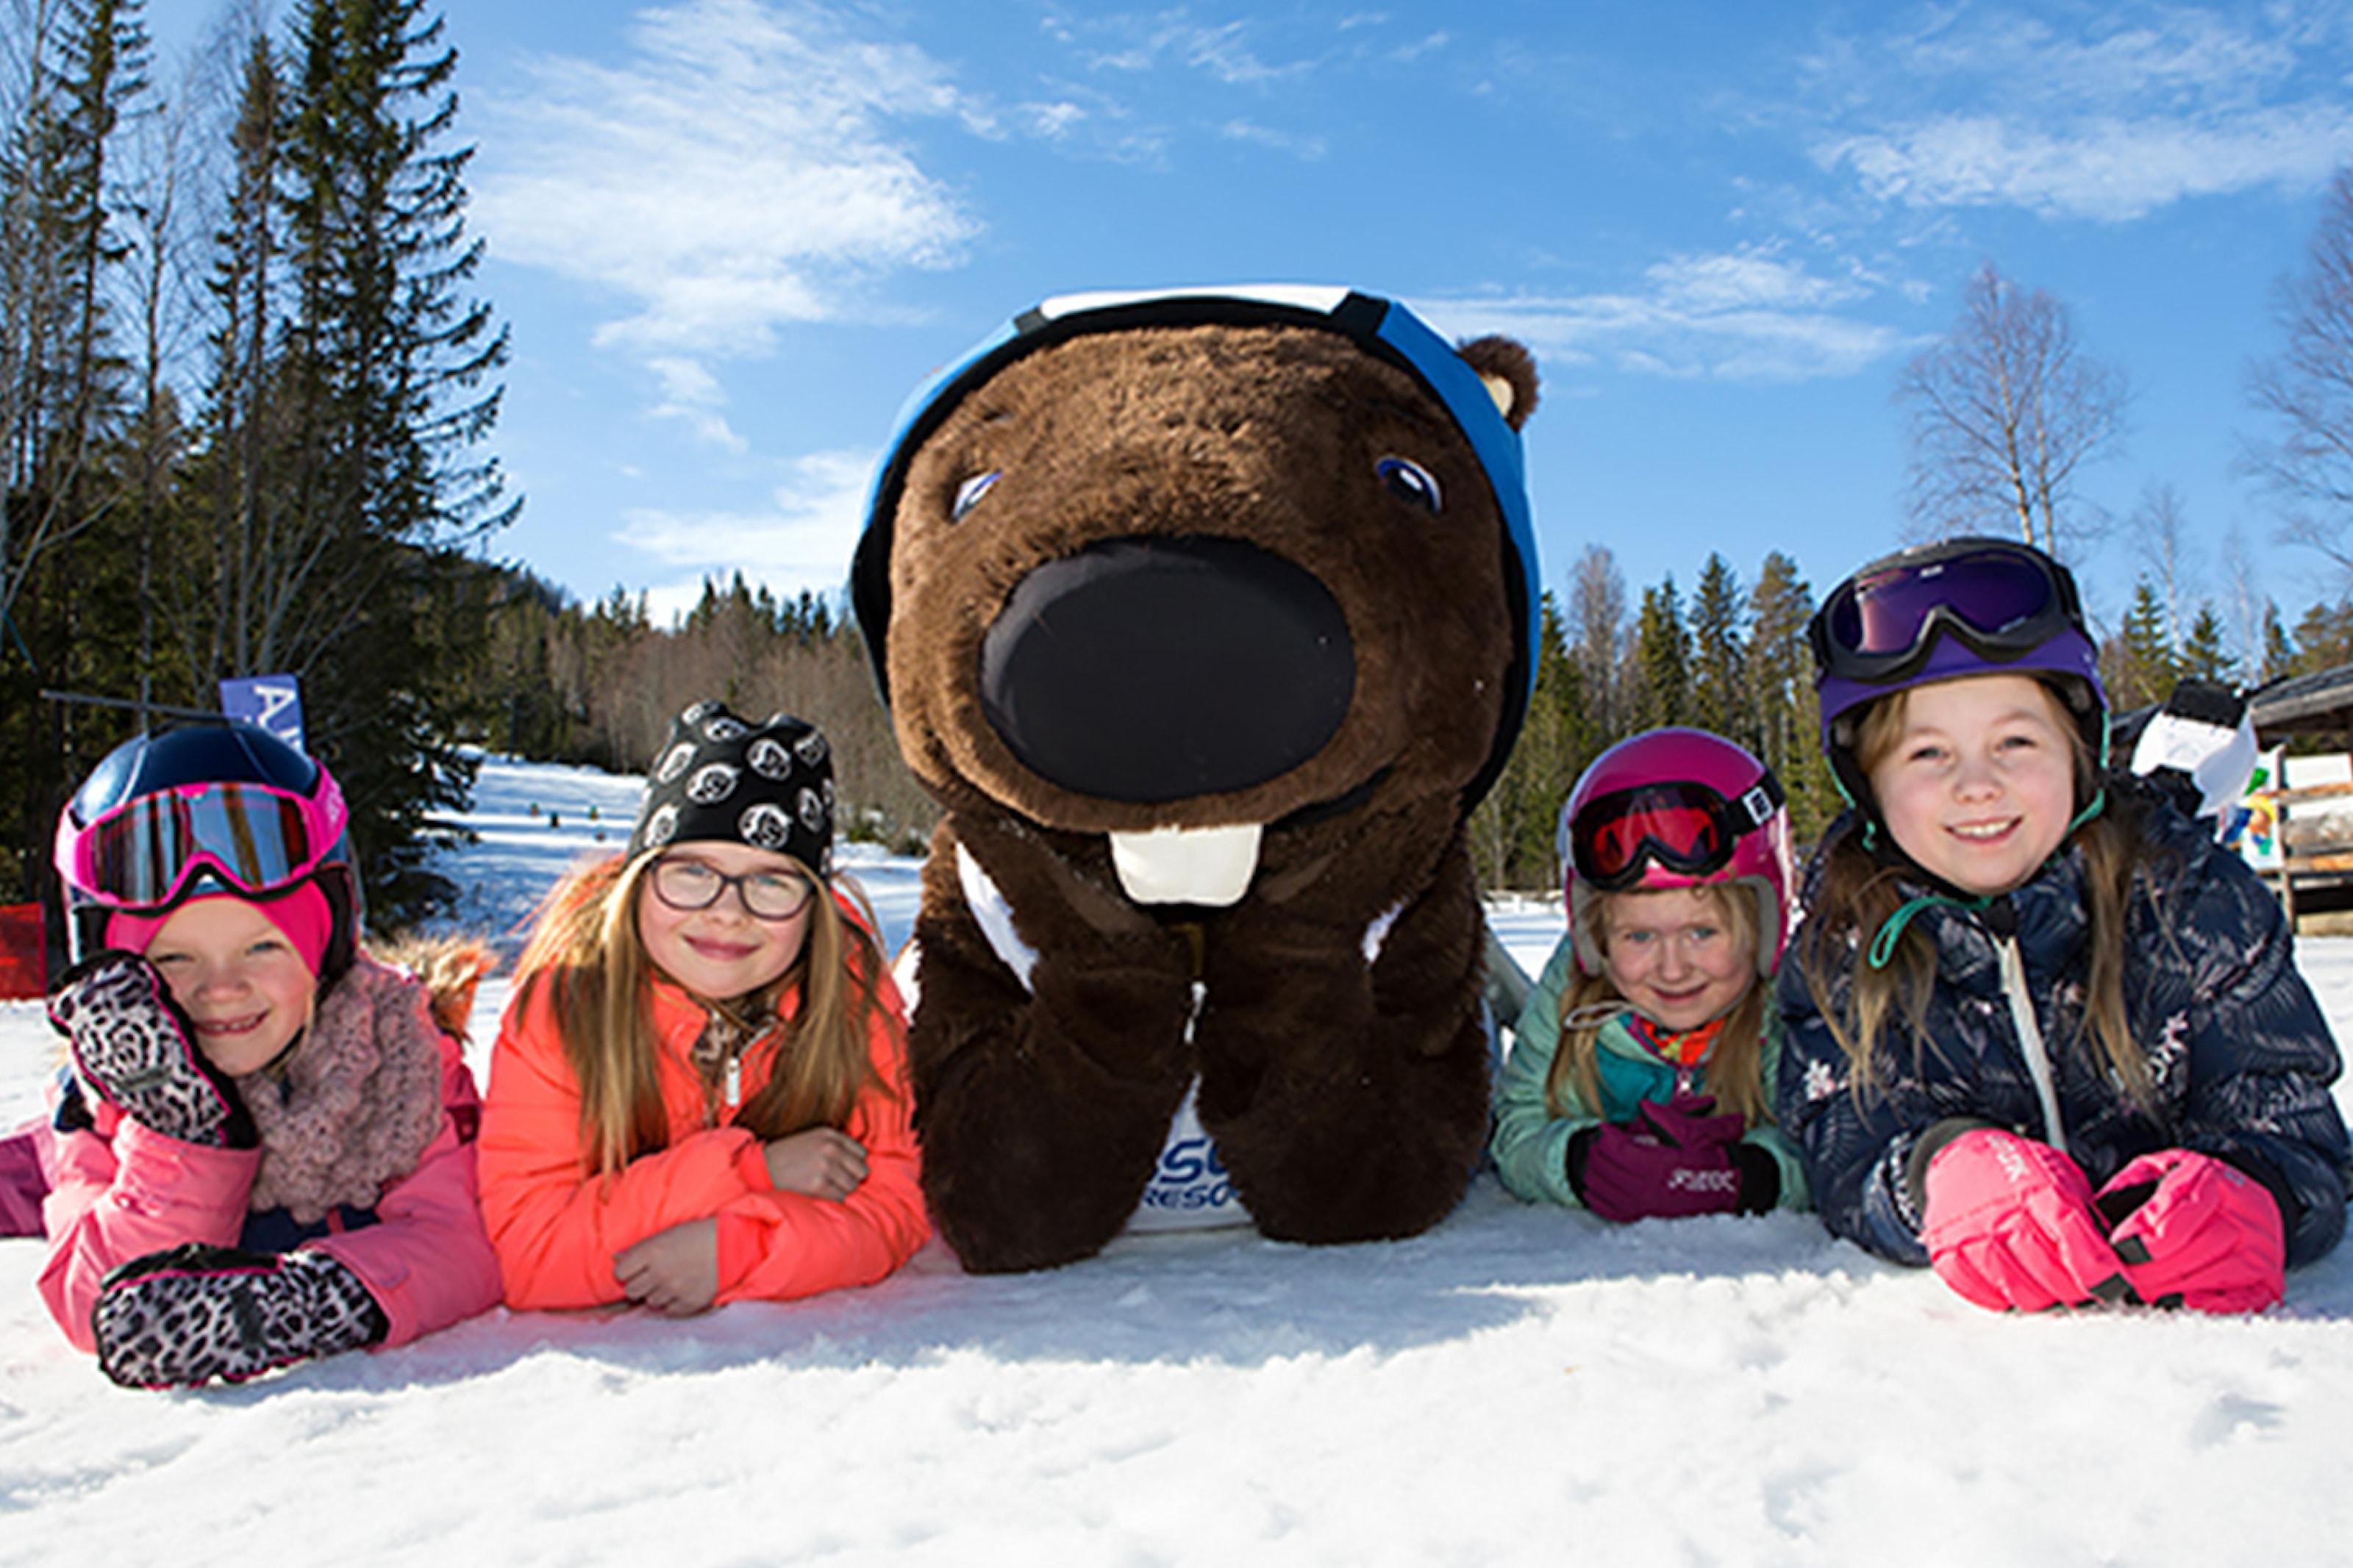 Bennys Barnveckor på Hassela Ski Resort